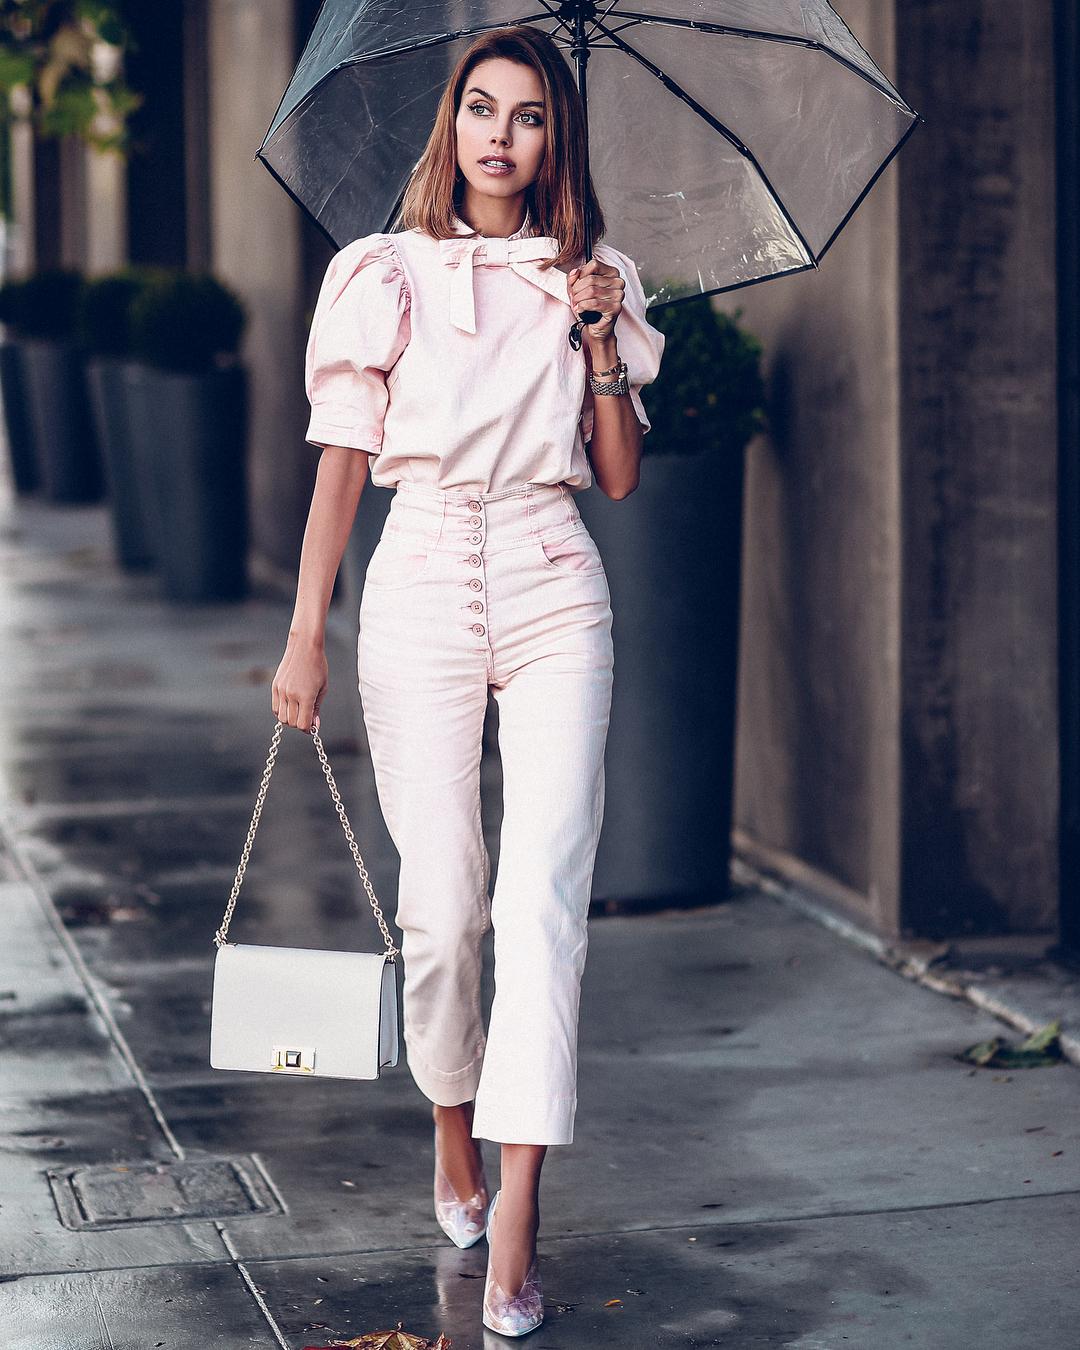 bag white bag shoulder bag pumps high waisted pants white pants white blouse puffed sleeves umbrella